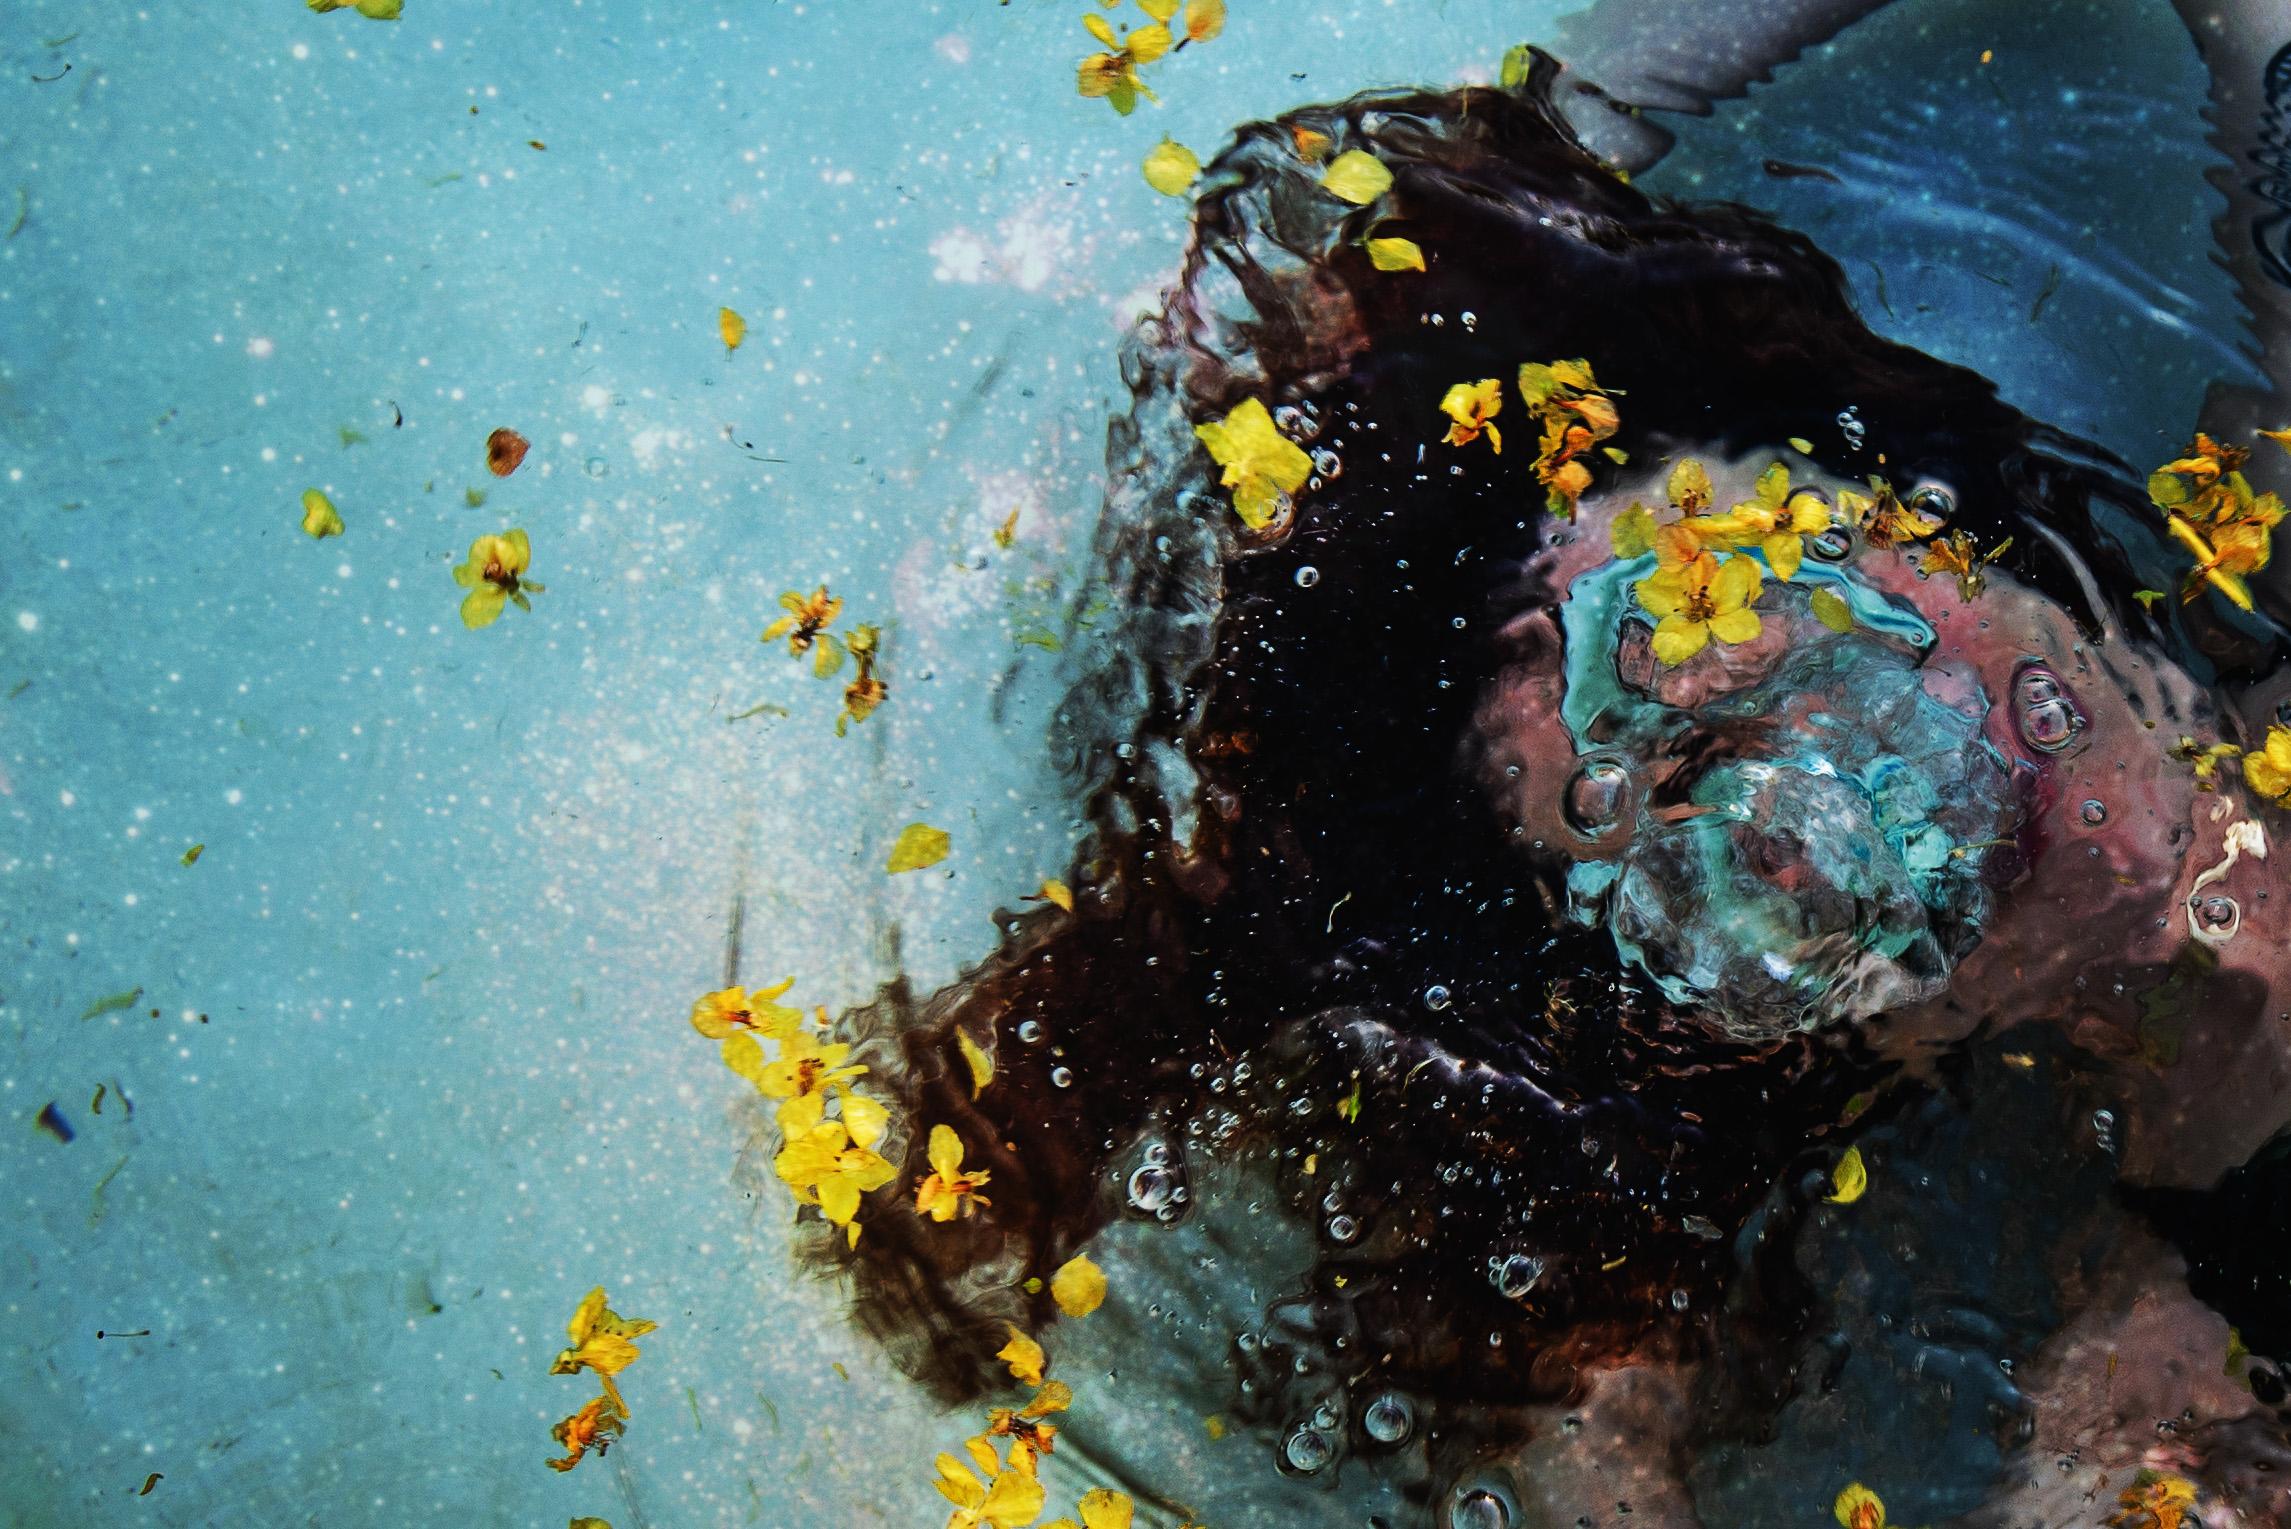 kendra pool 2 by sue beauchamp.jpg